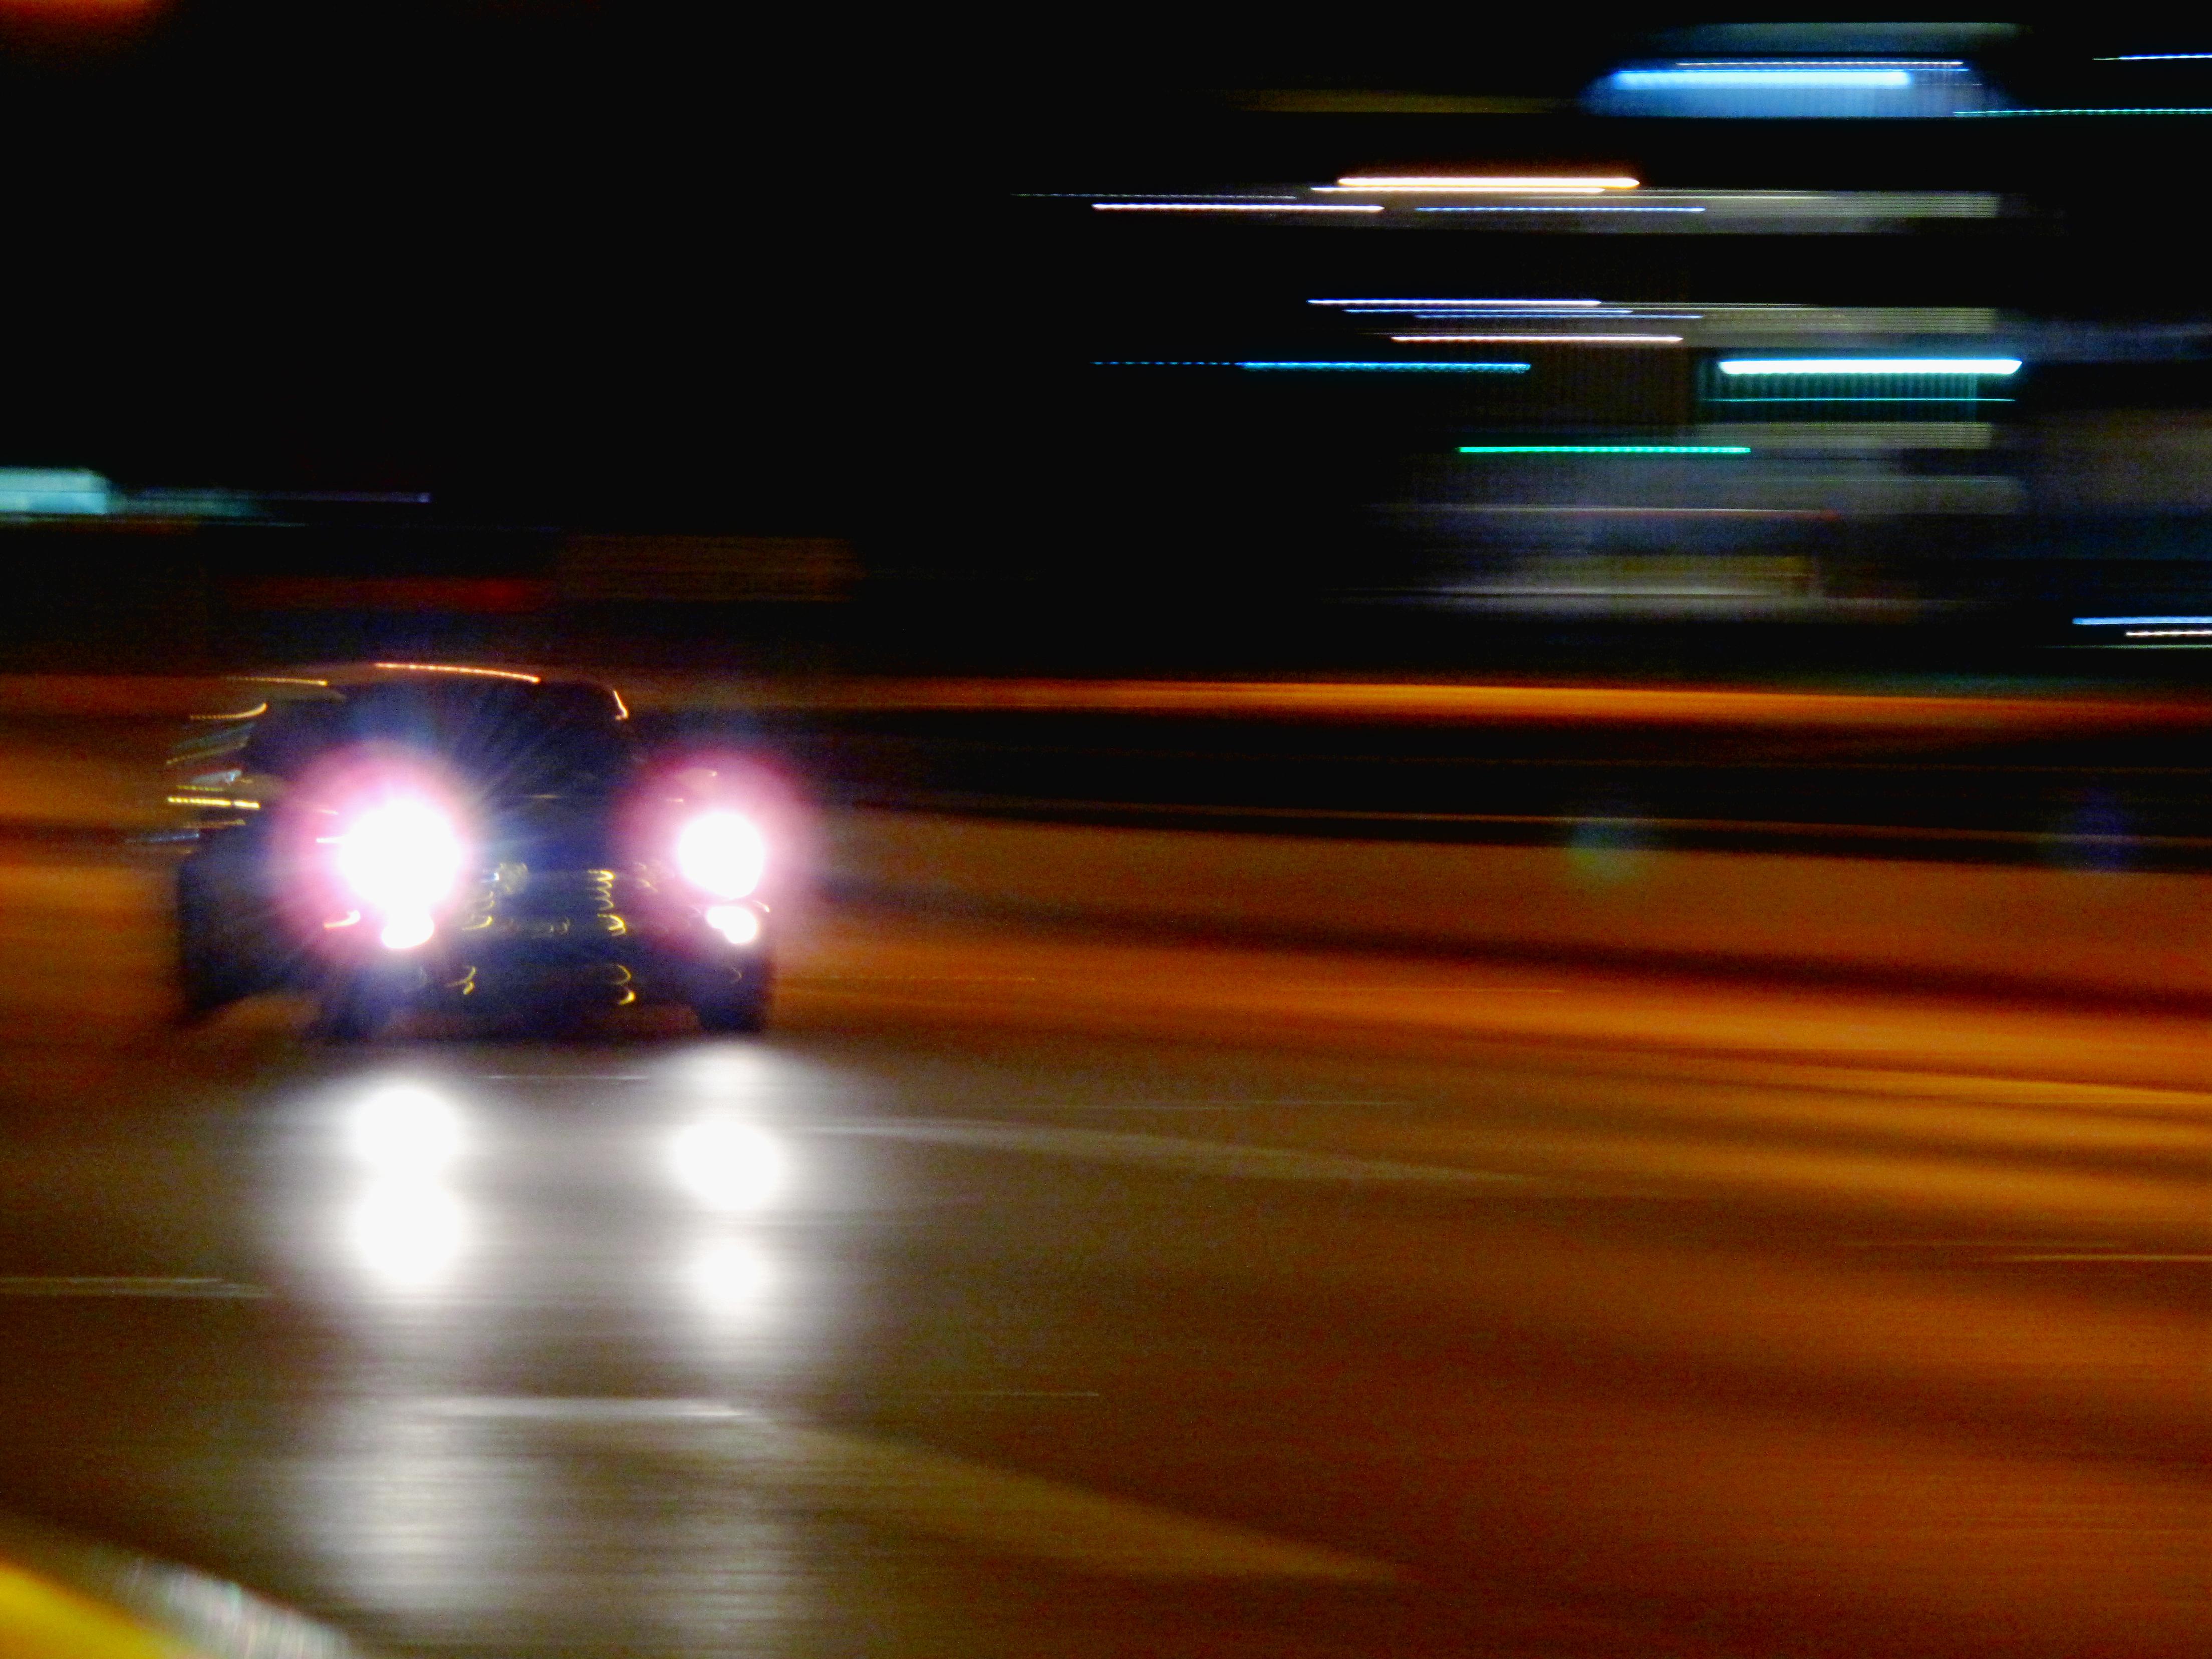 Mini Cooper Action, Action, Blur, Cooper, Driving, HQ Photo